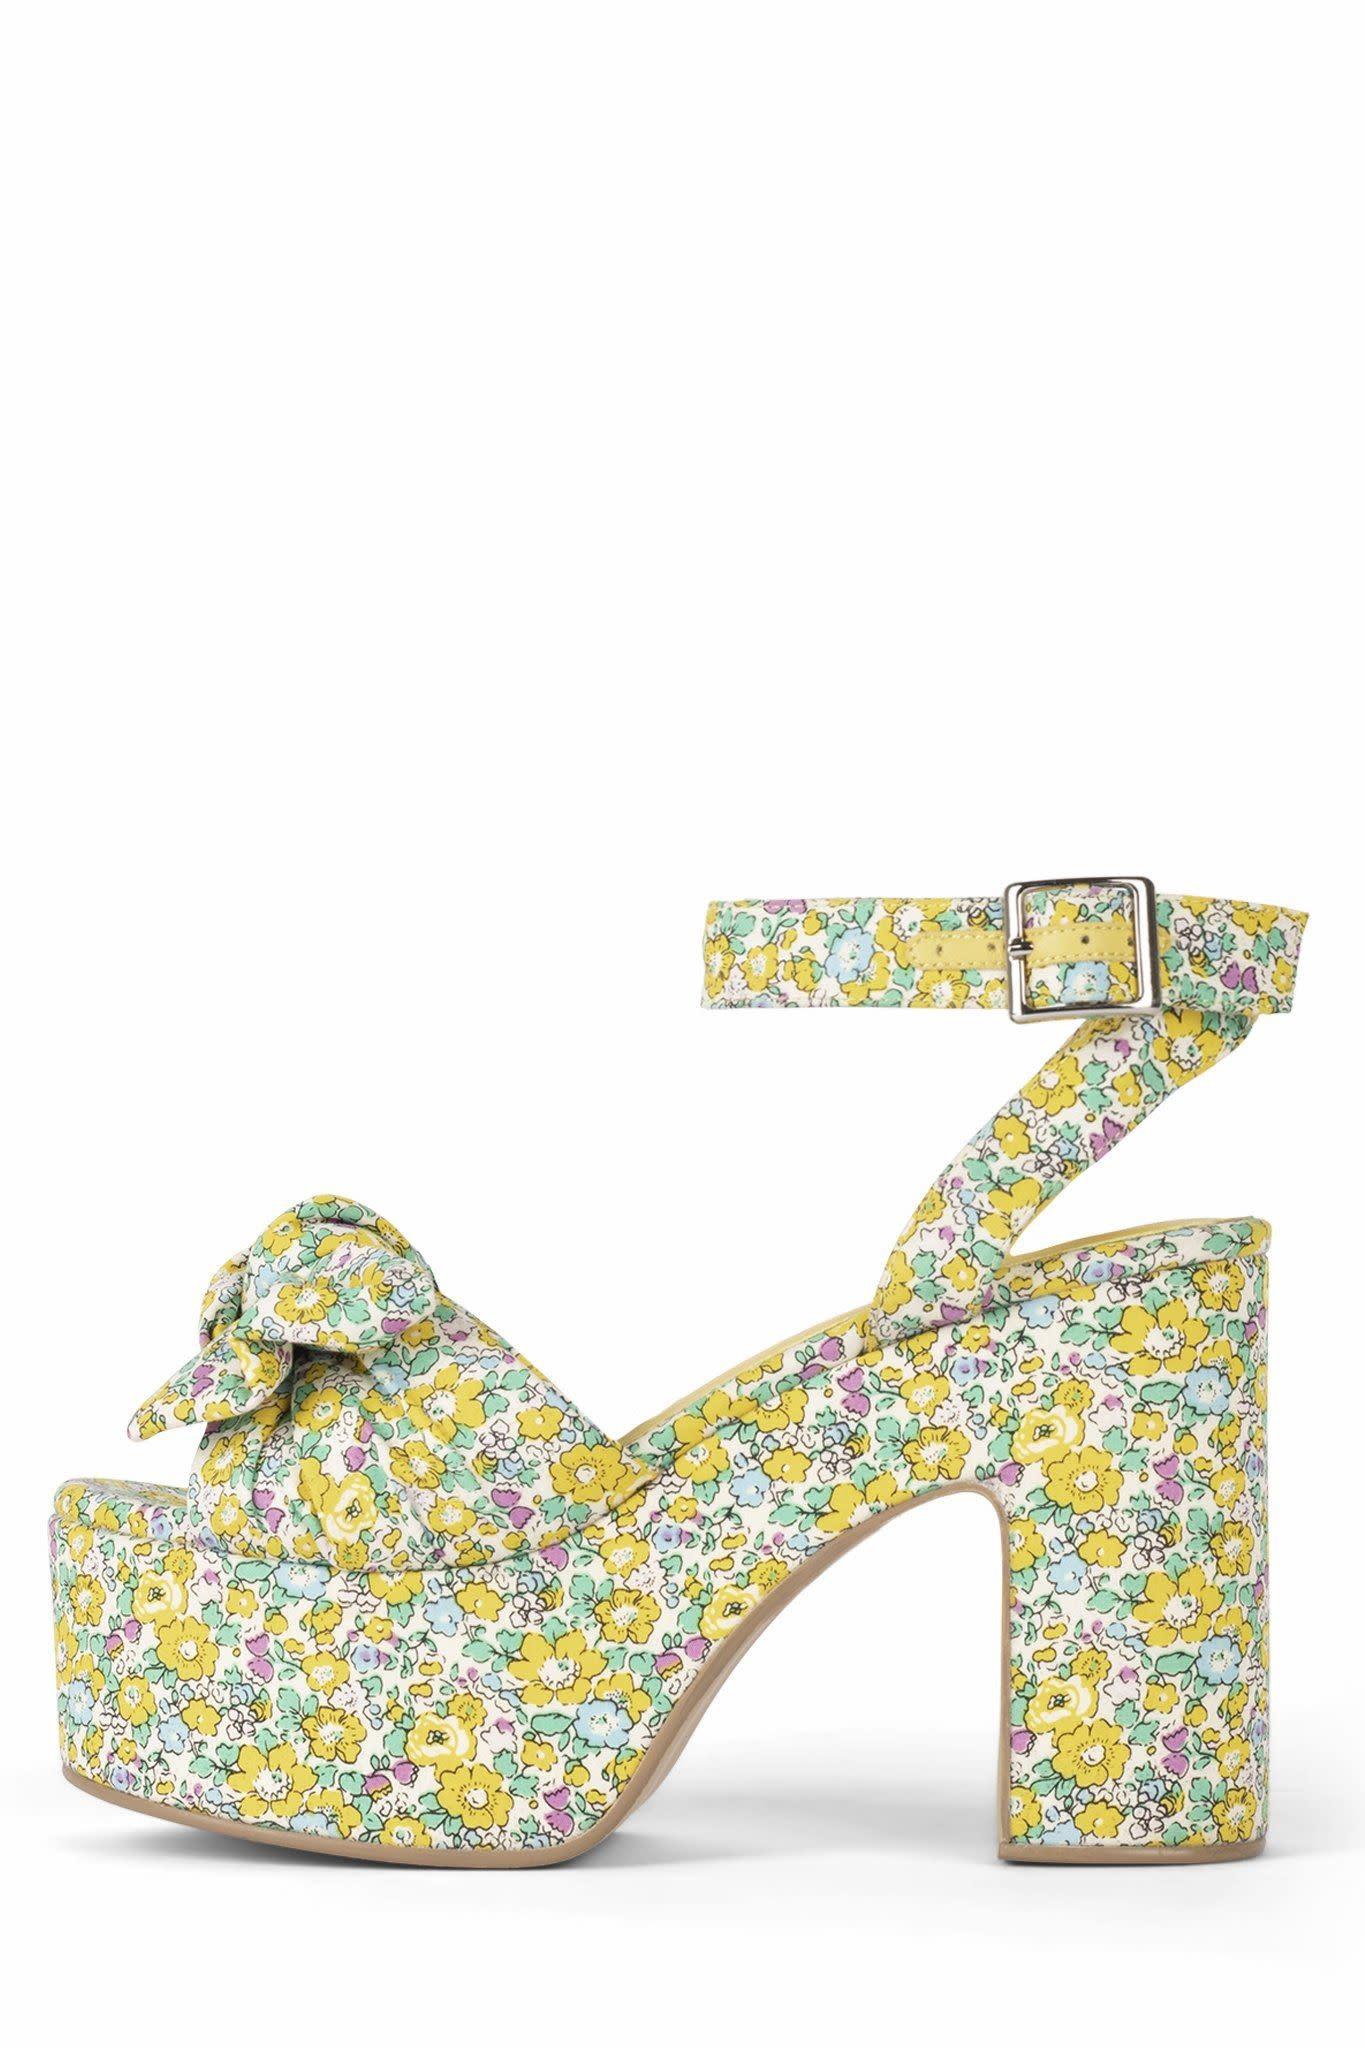 Jeffrey Campbell Pic-Nic Yellow Floral Platform